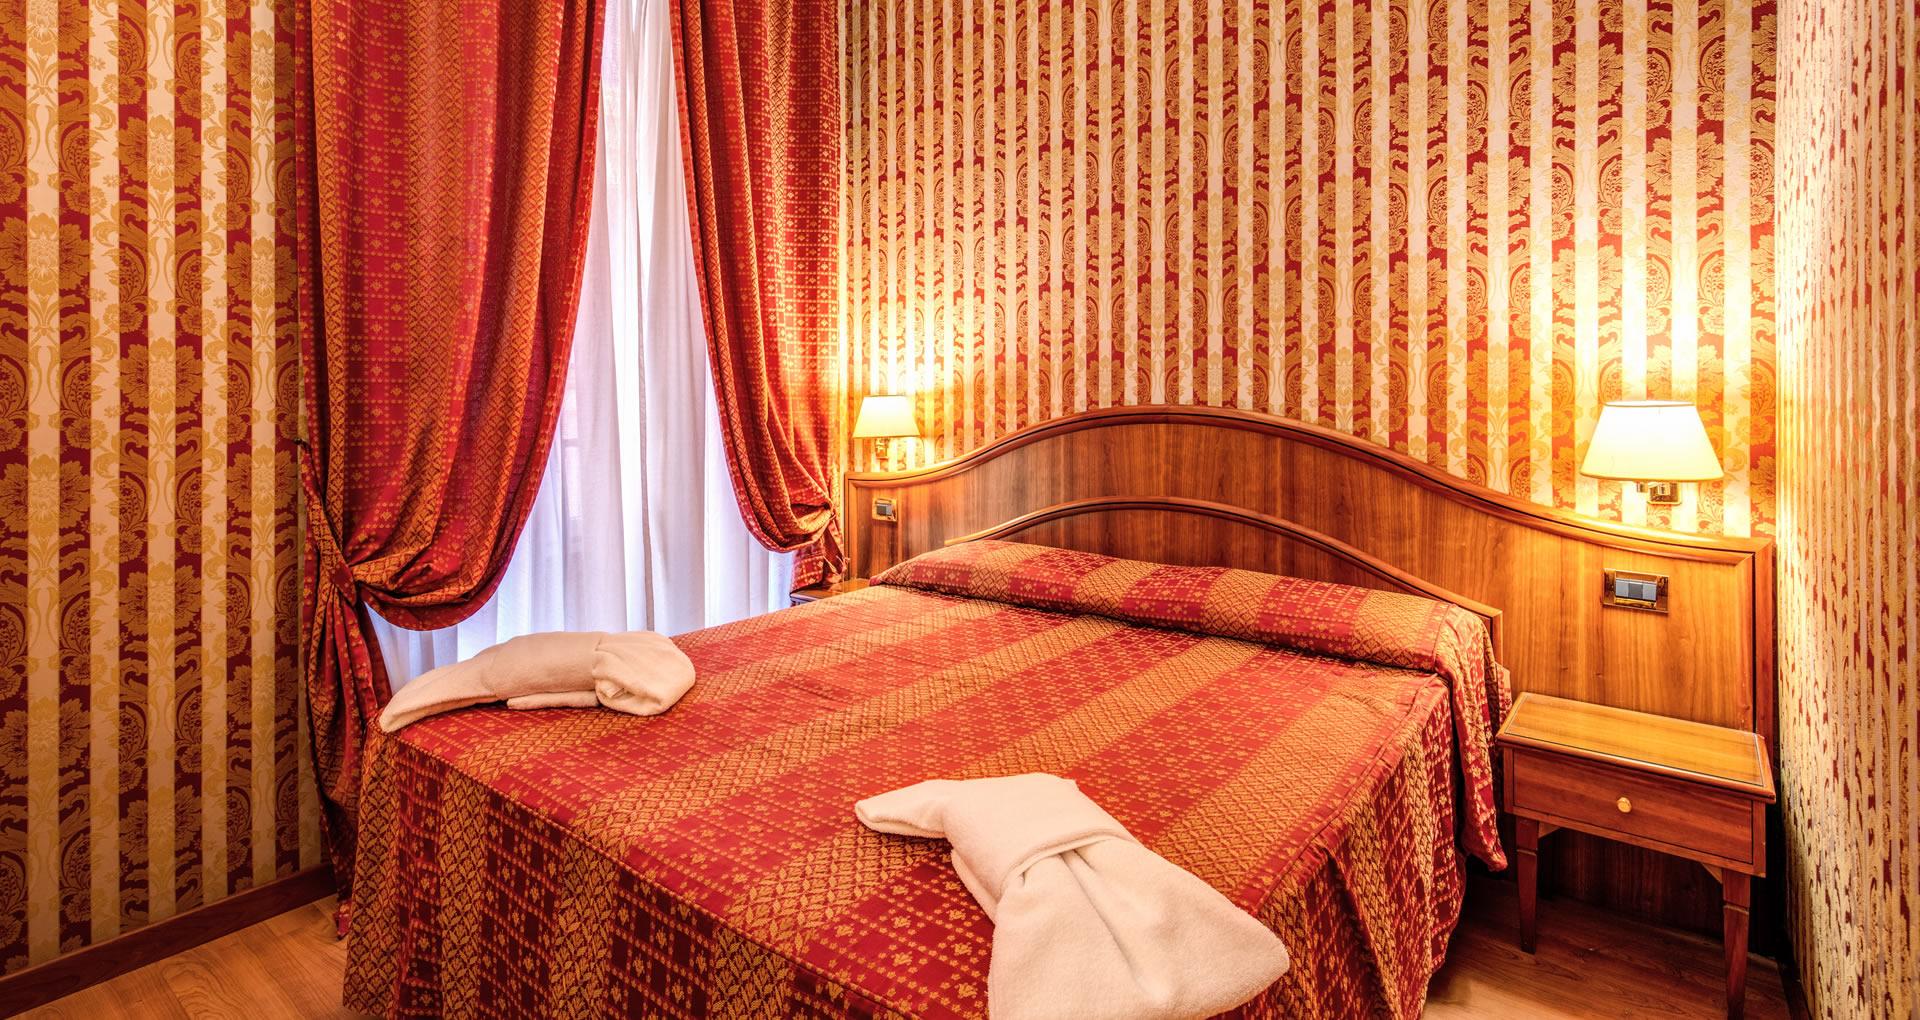 Rome Hotel Invictus Official Site 3 Star Hotel